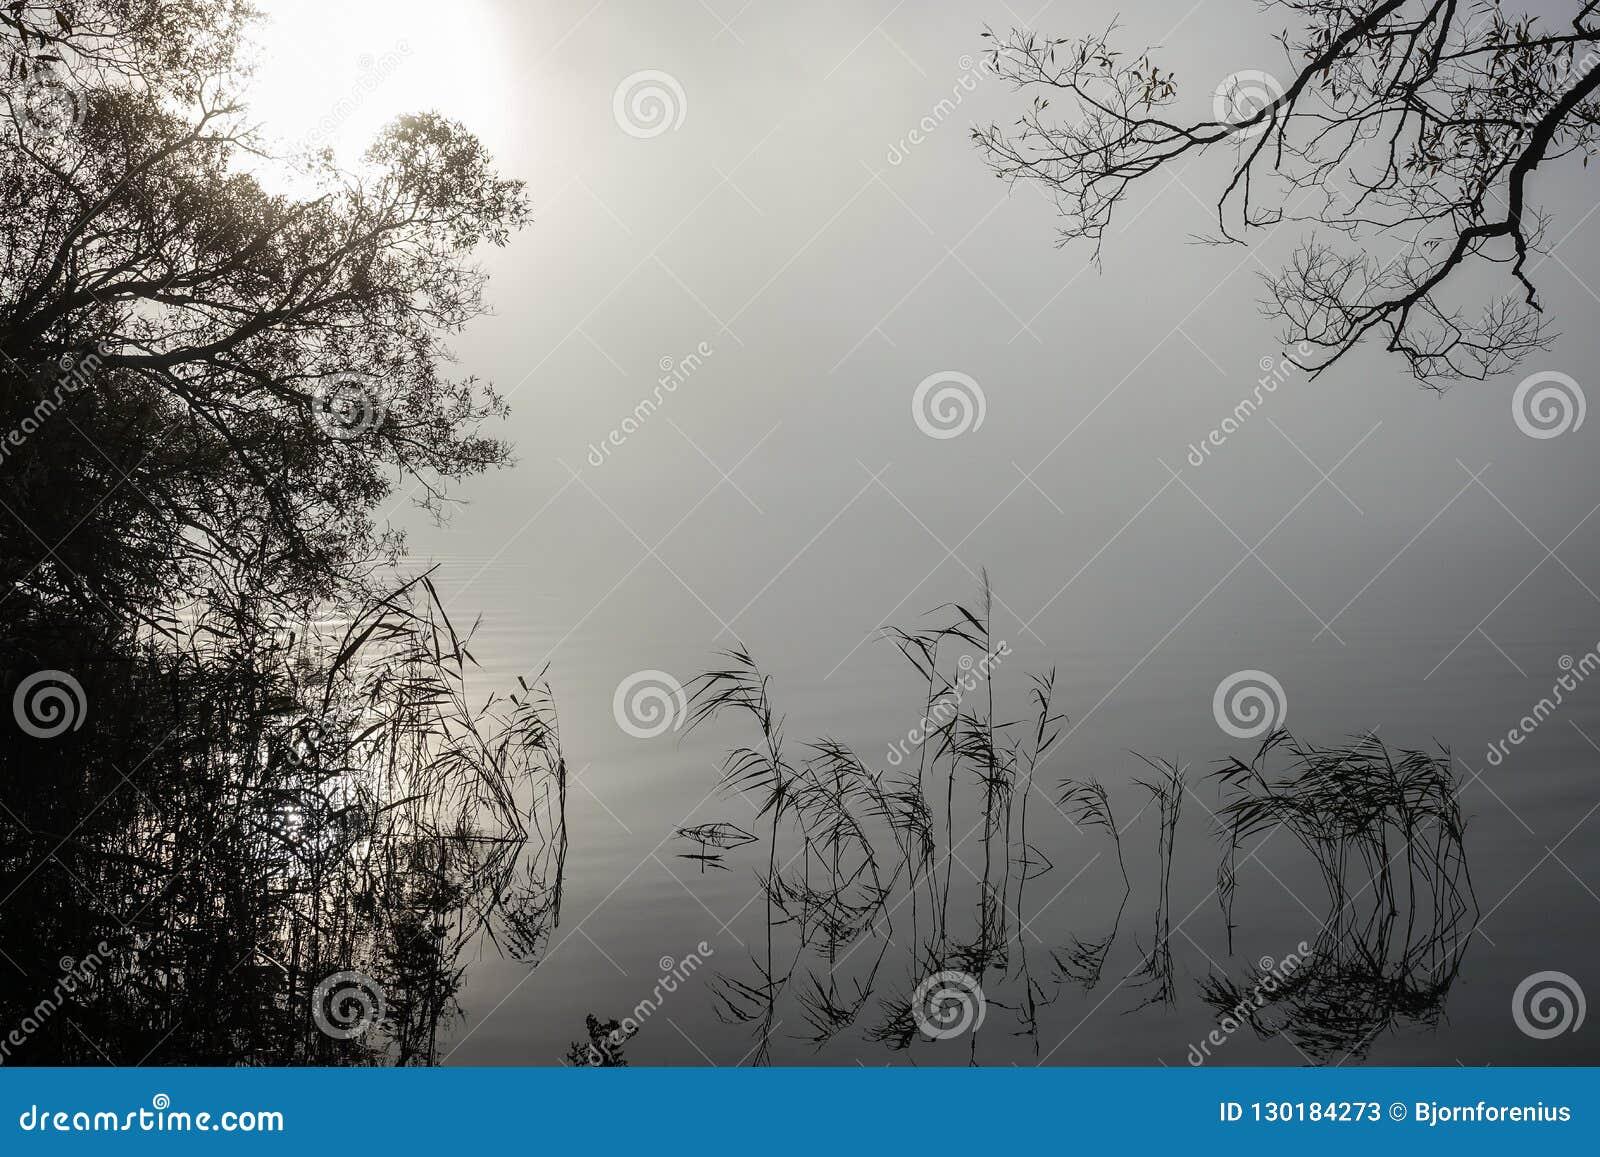 Zachte rimpelingen in nevelig landschap Vreedzame dikke mist